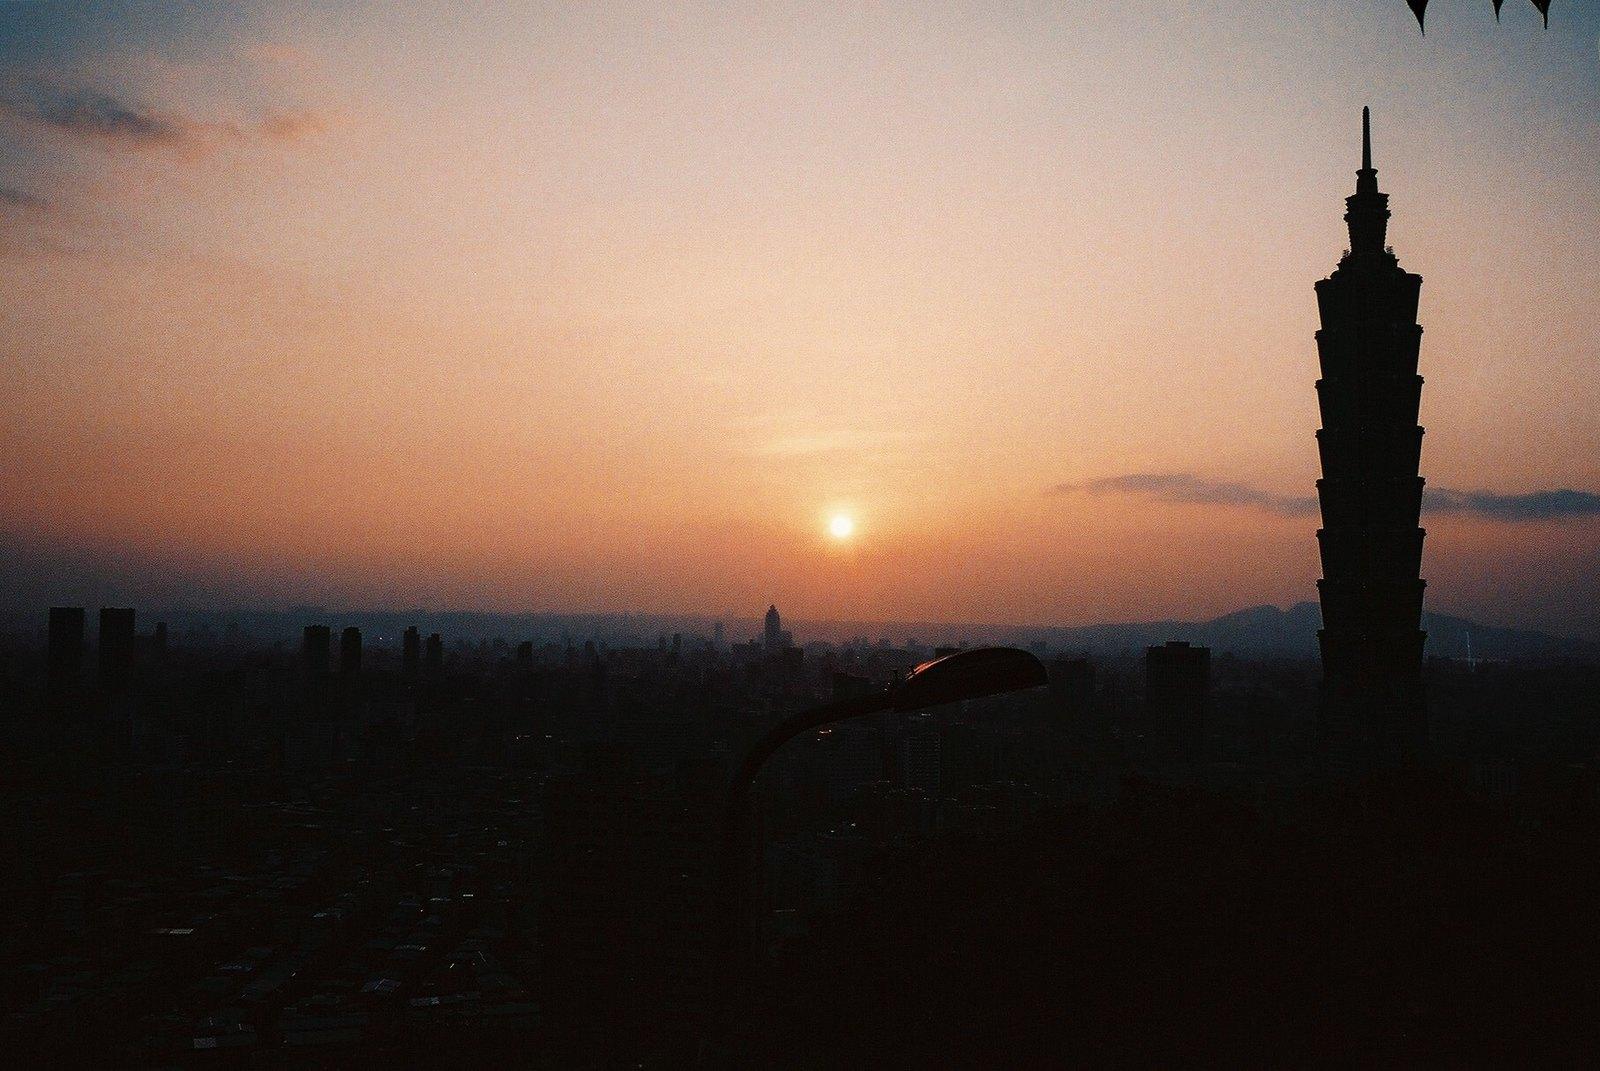 Vista de Taipei al atardecer